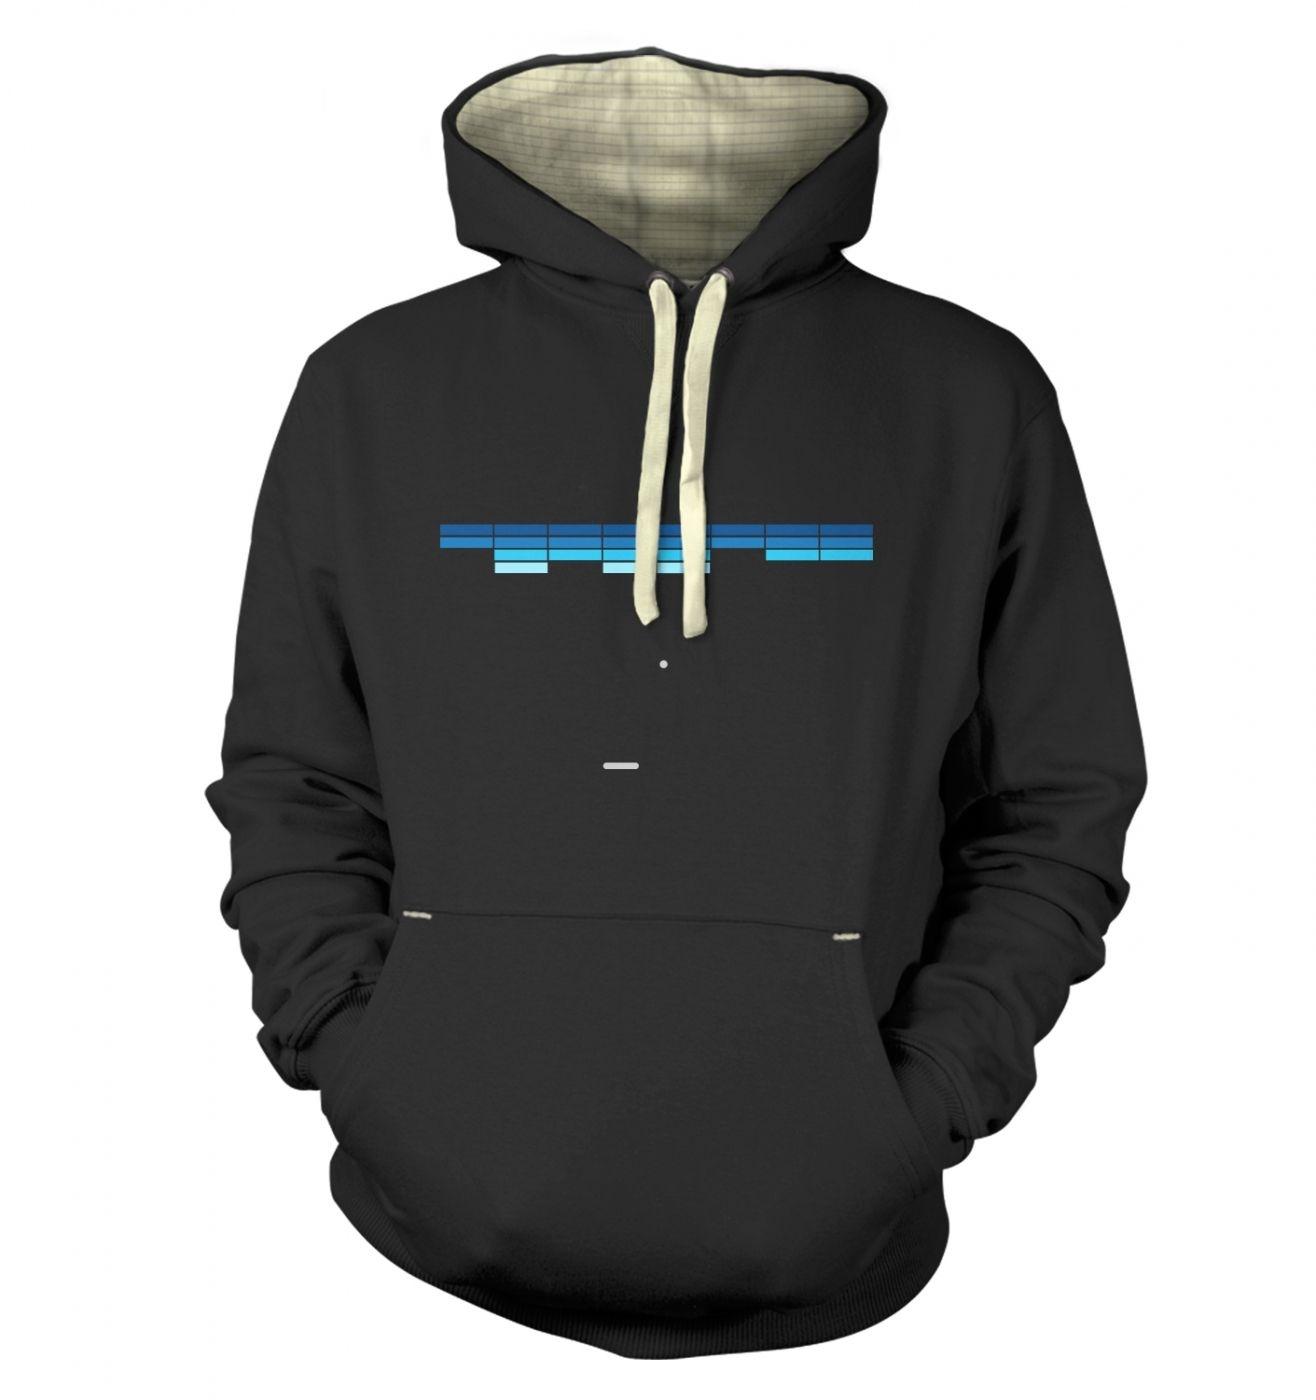 Retro Arcade Style (purple/blue) premium hoodie